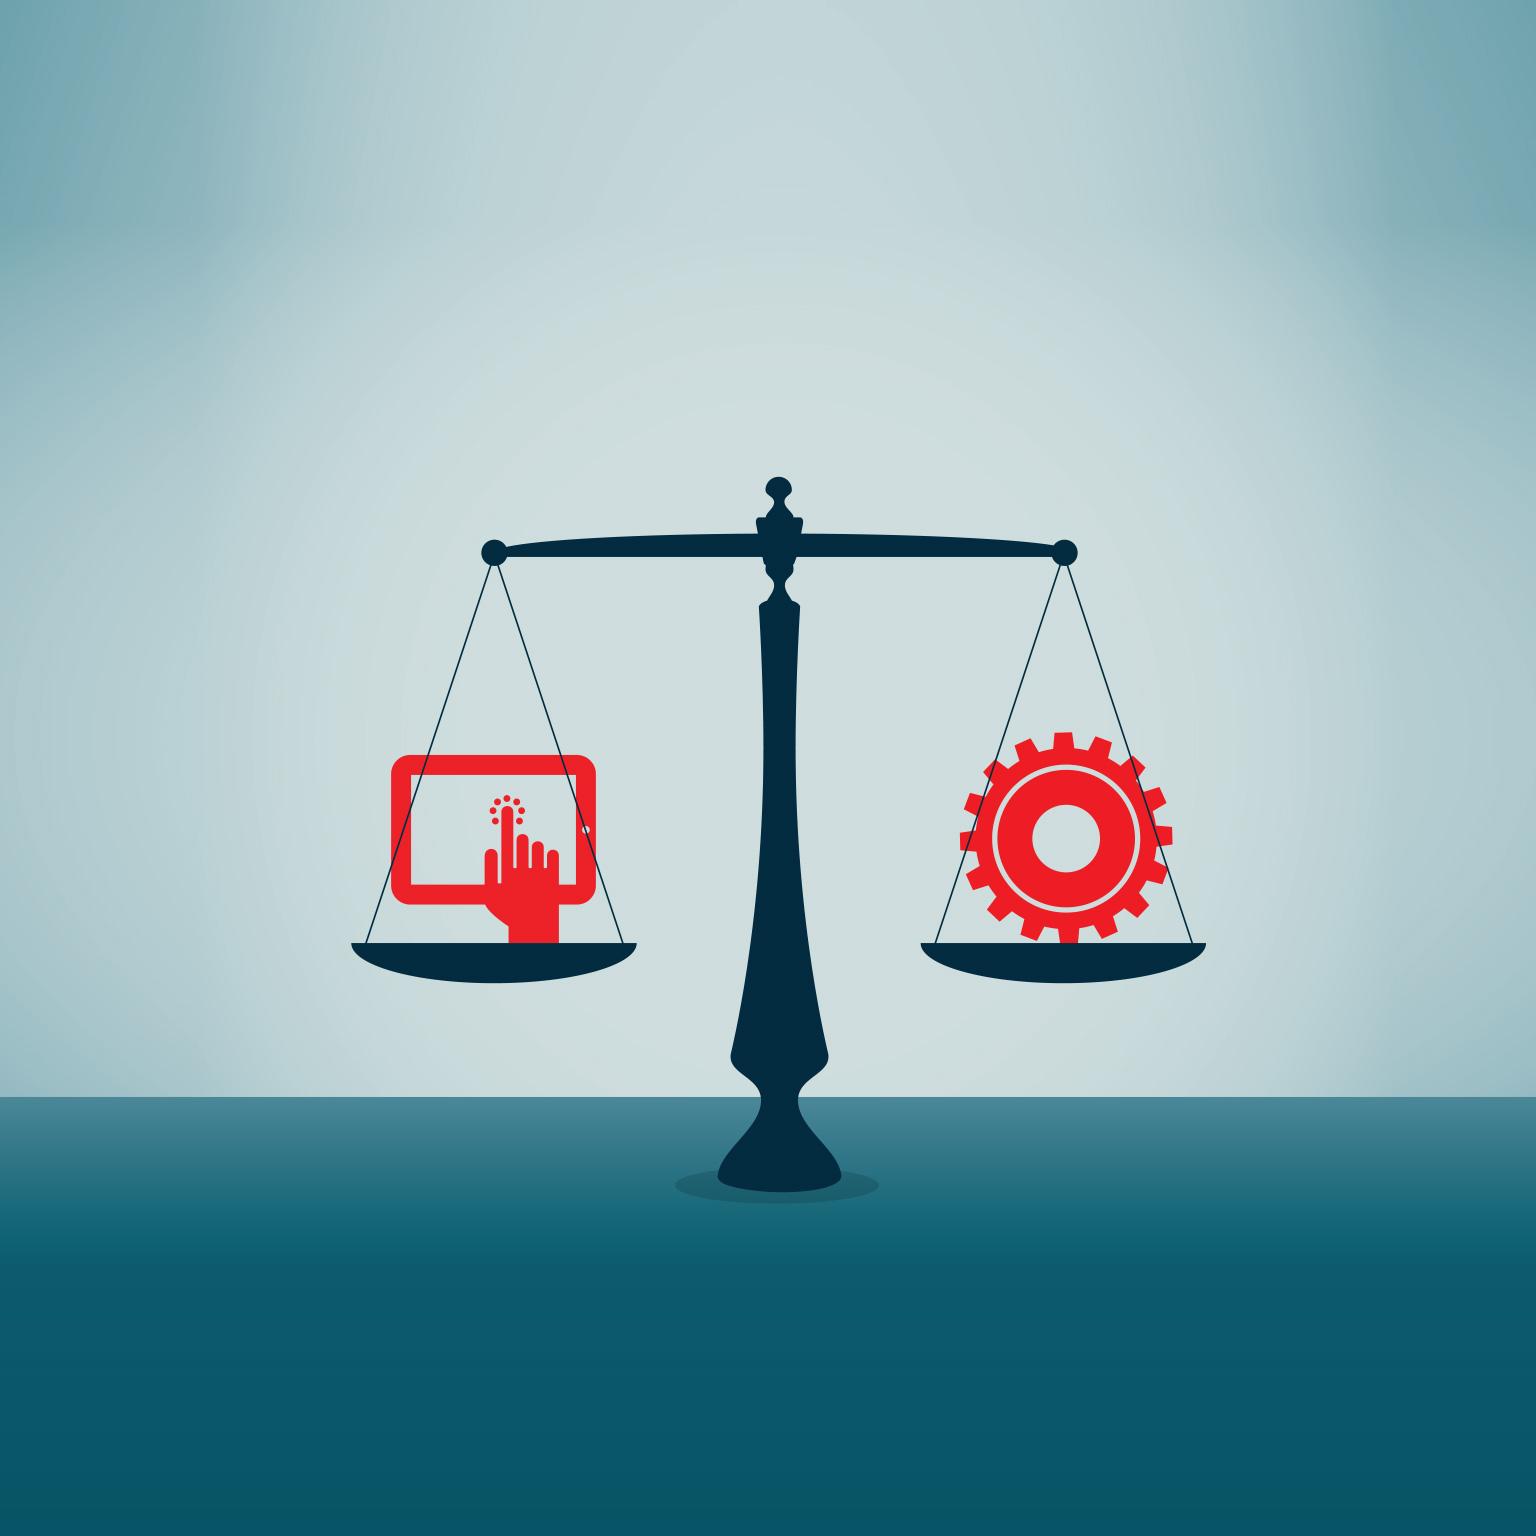 To improve B2B customer experience, get the digital-analog balance right | Digital McKinsey